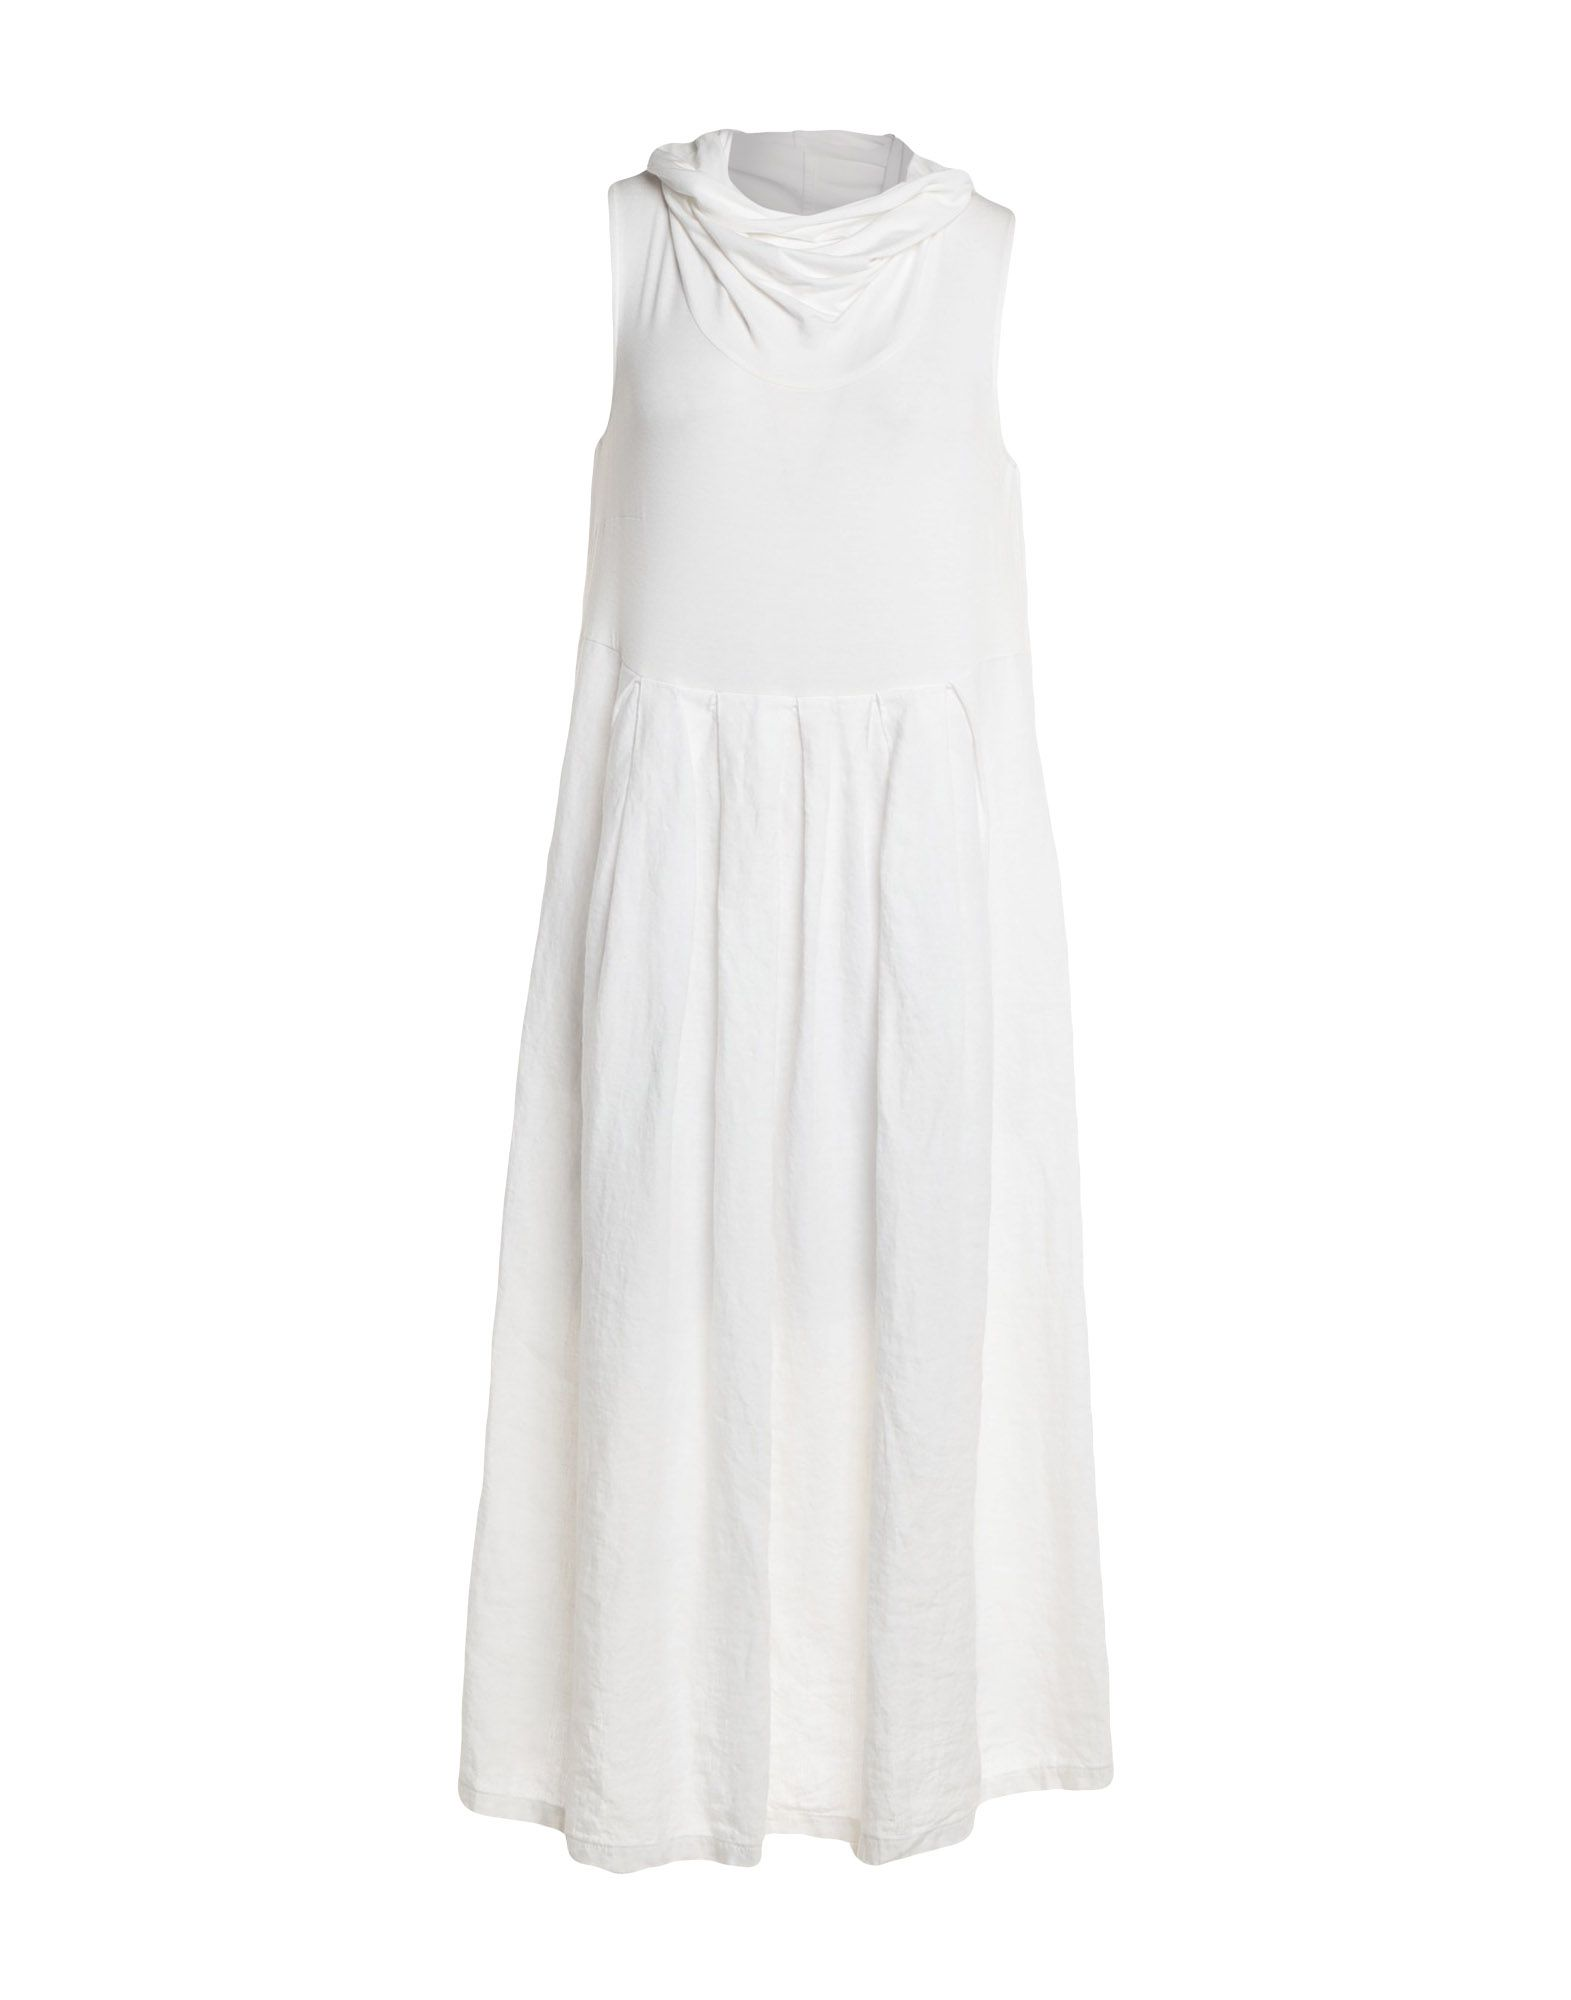 MY LAB Платье длиной 3/4 платье quelle my style 1003975 page 4